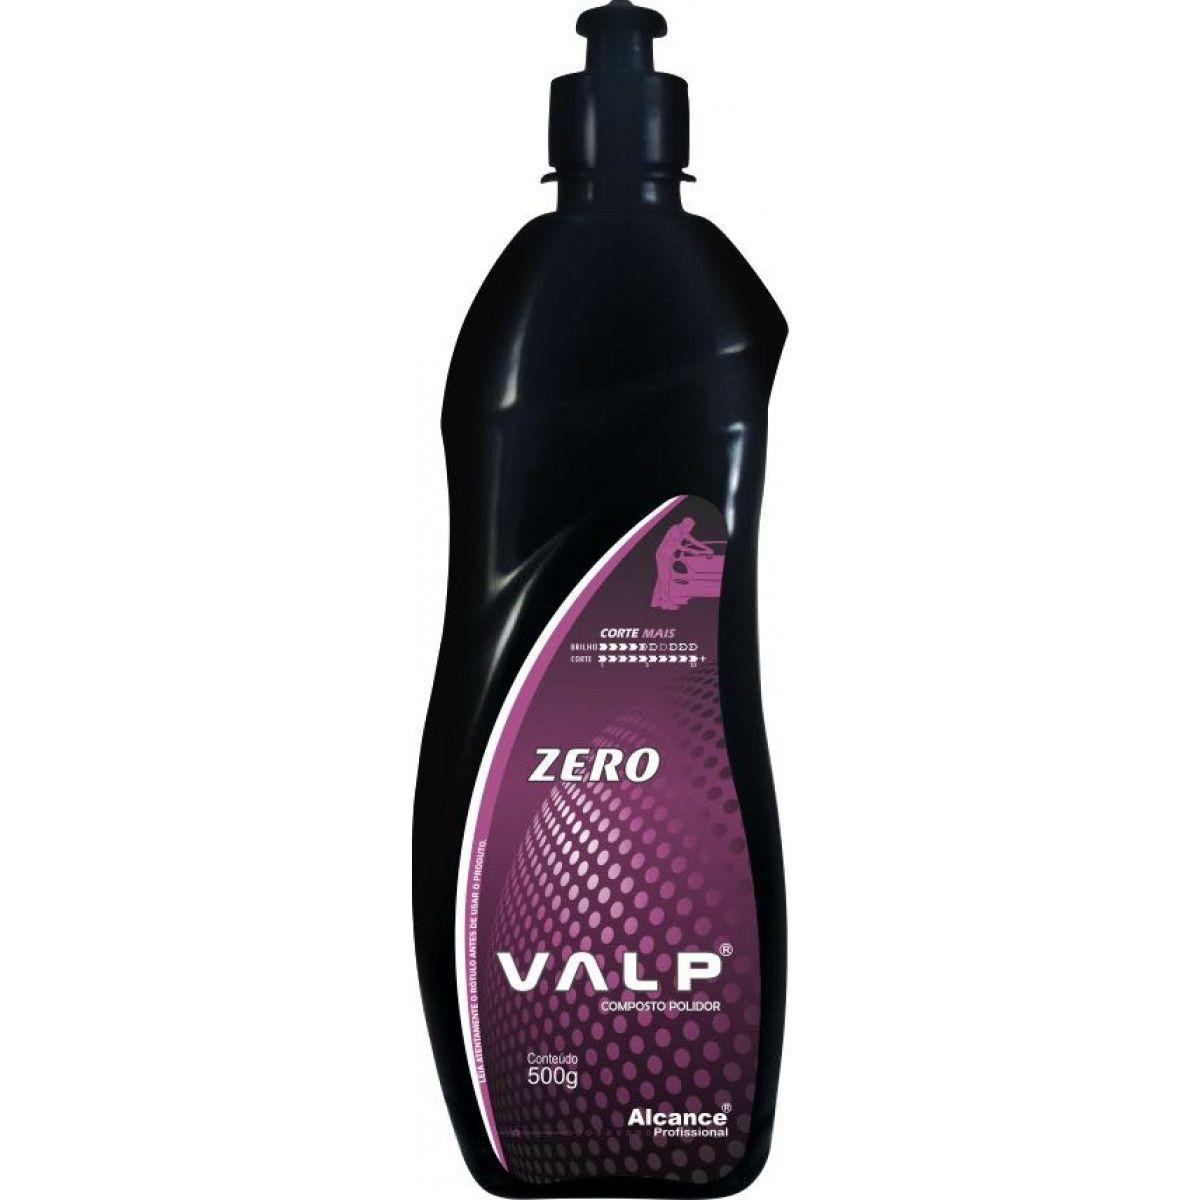 Valp Zero Composto de Corte Pesado 500g Alcance Profissional